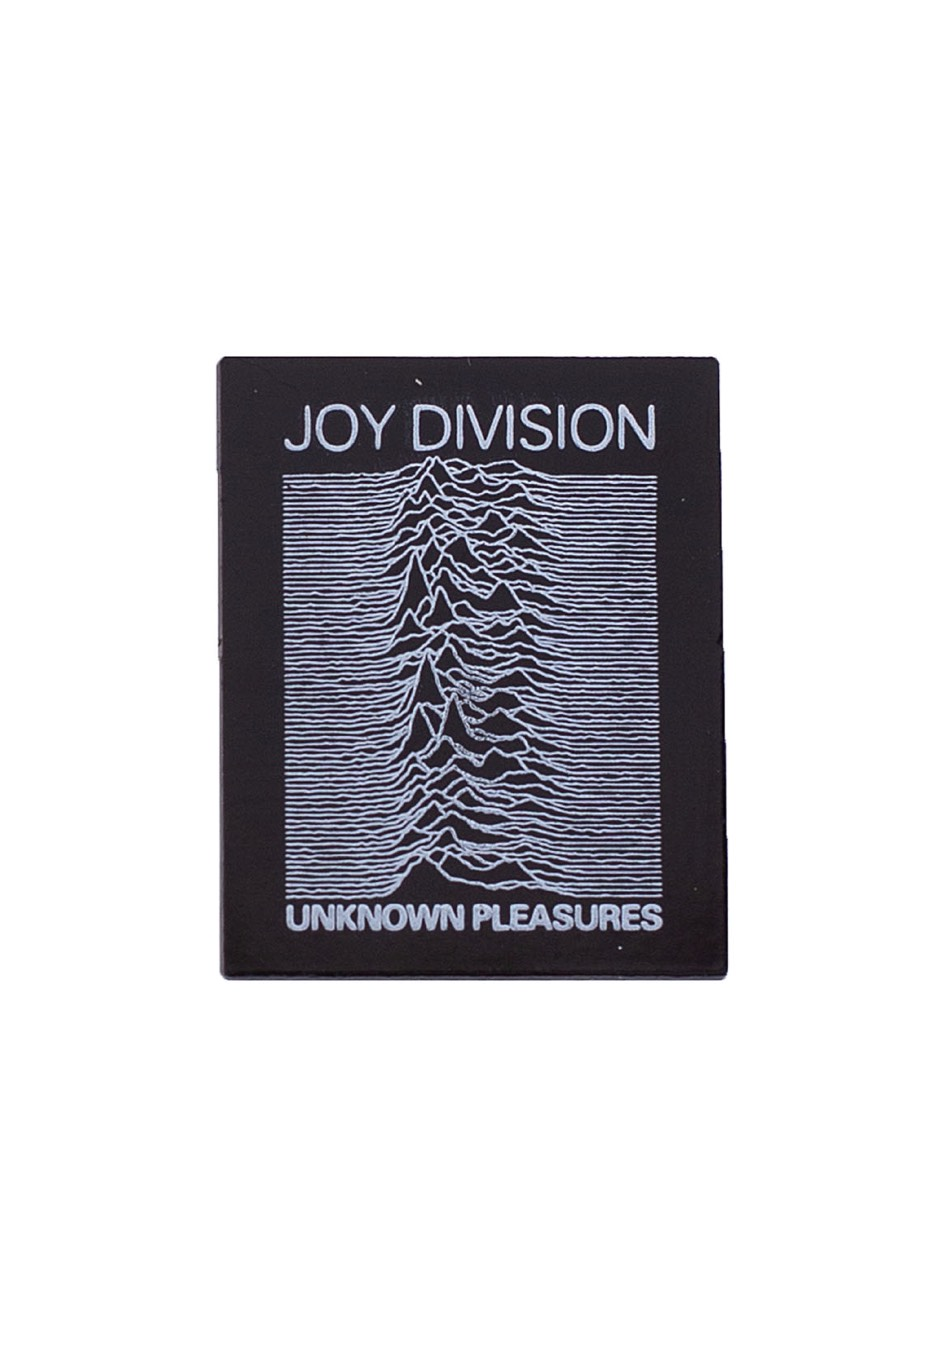 Joy Division - Unknown Pleasures - Pins